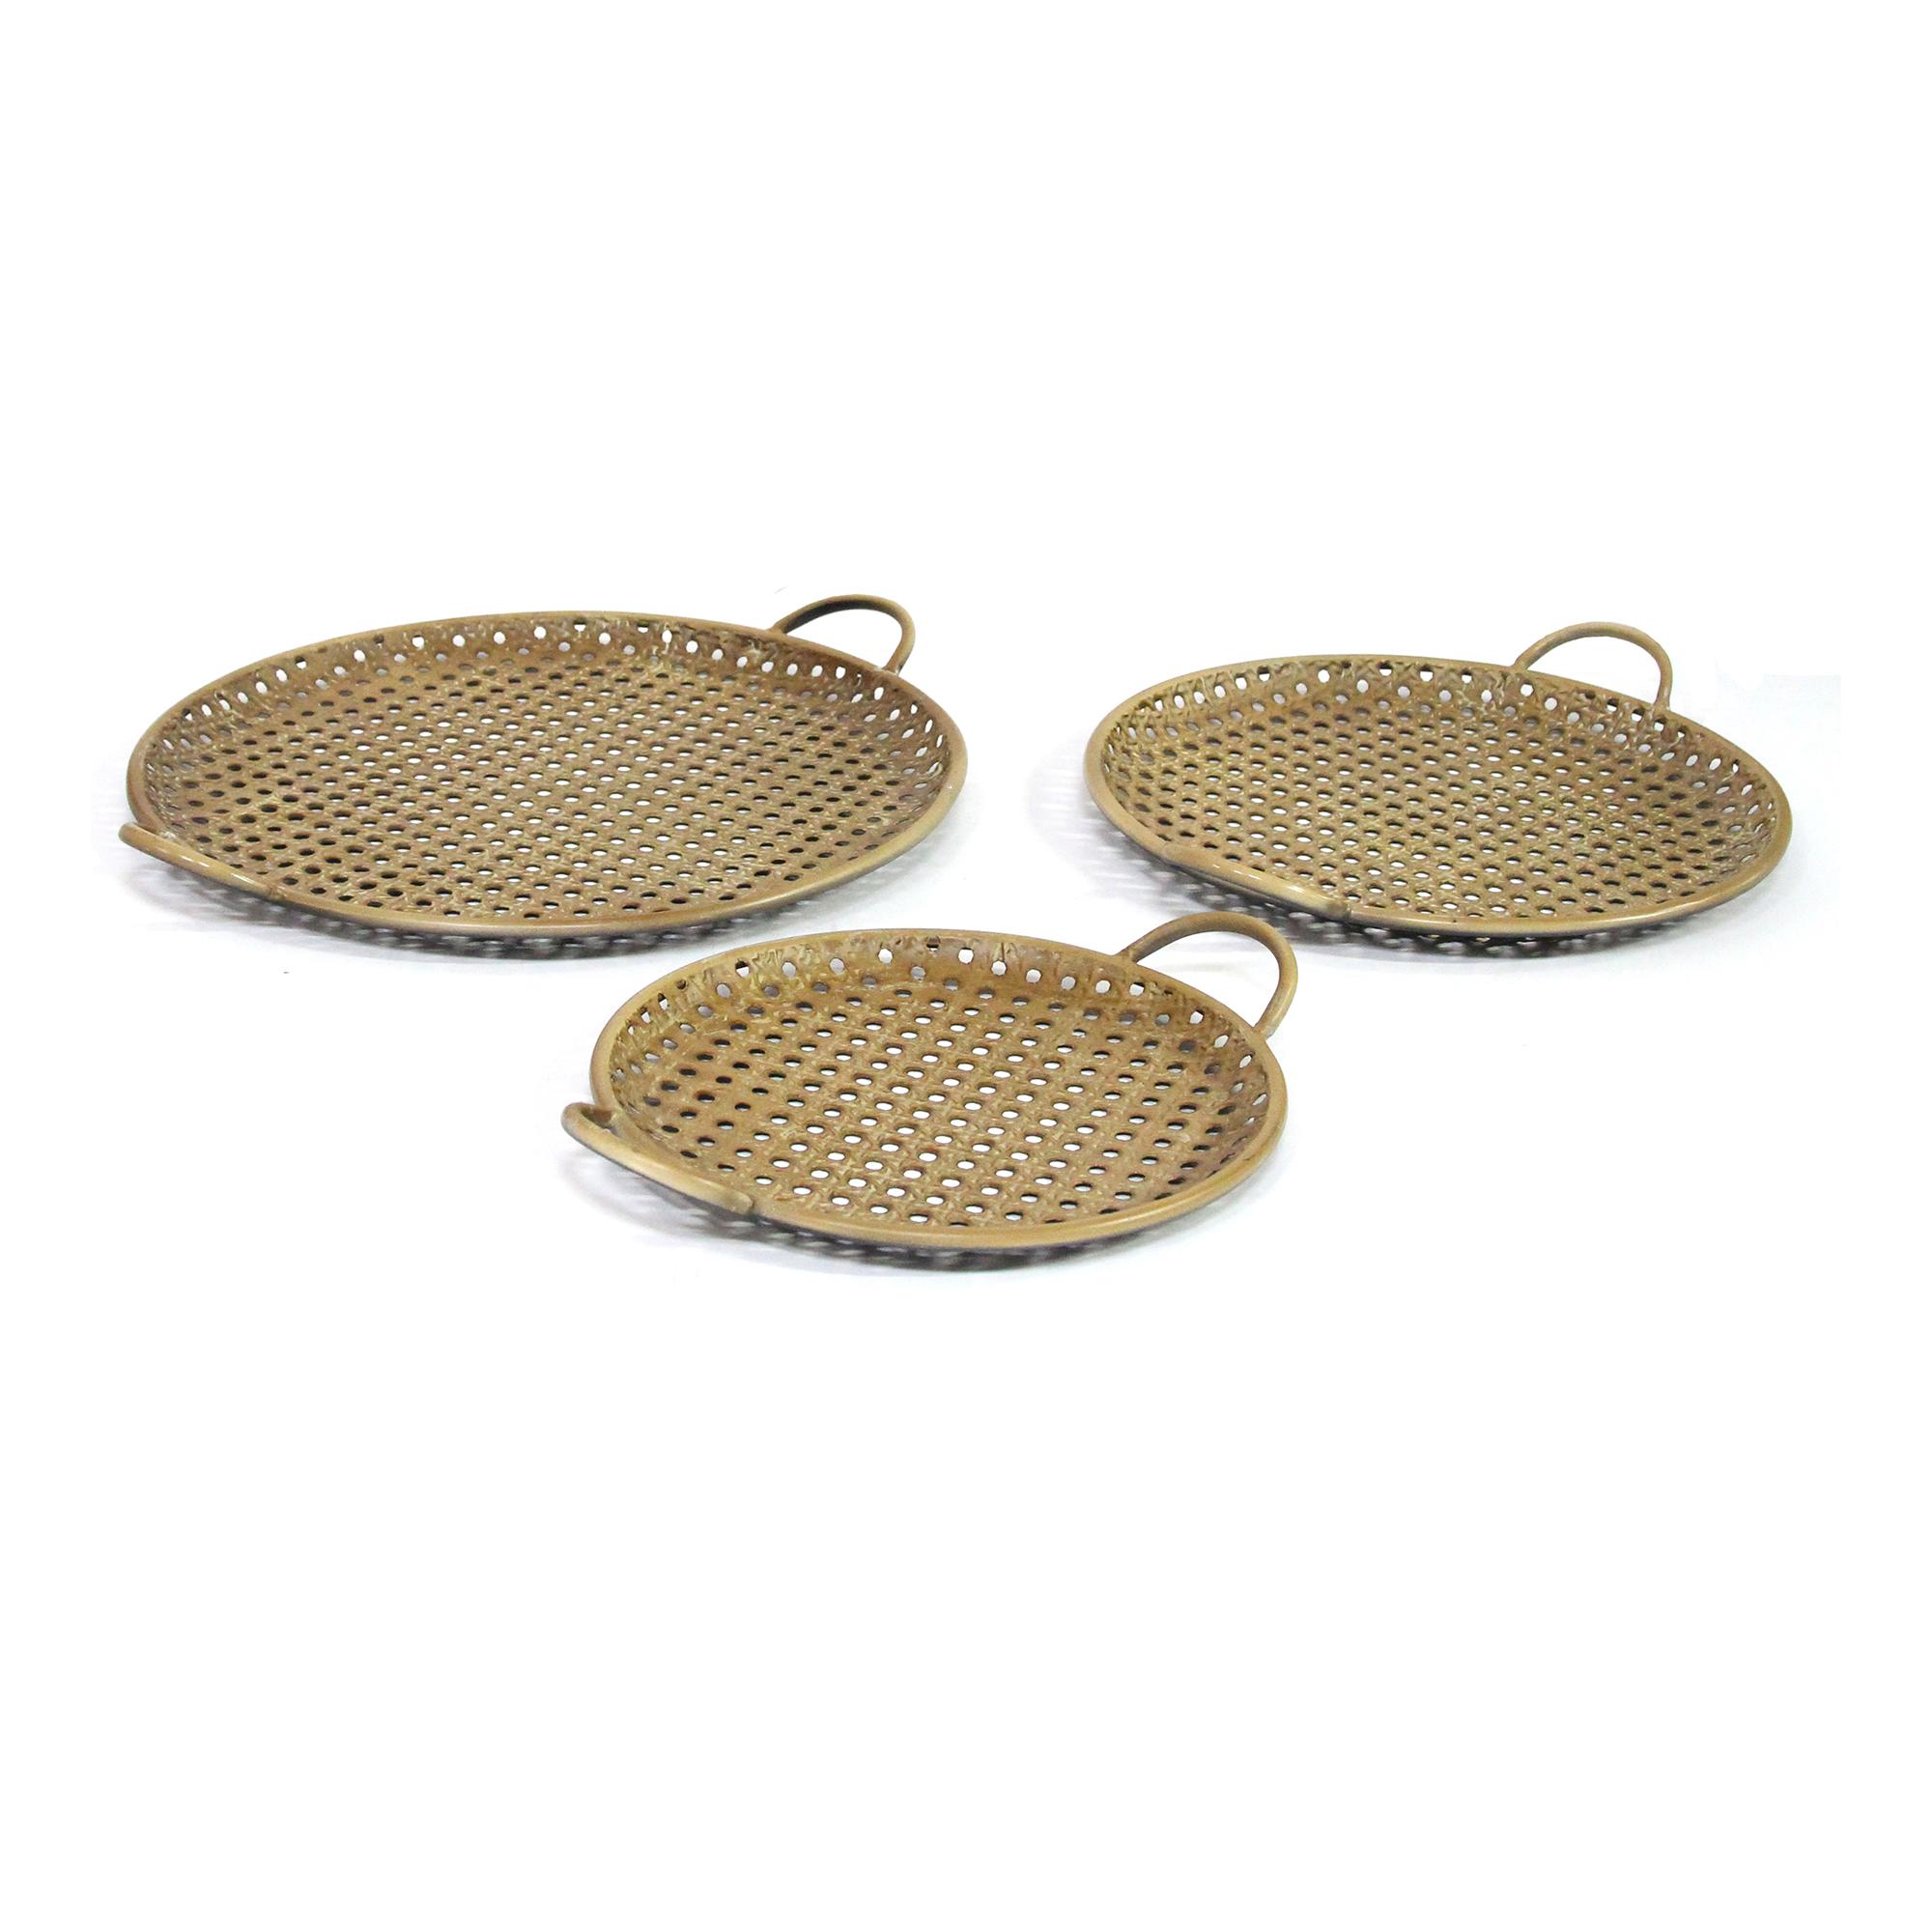 S 3 Carribean Decorative Metal Trays